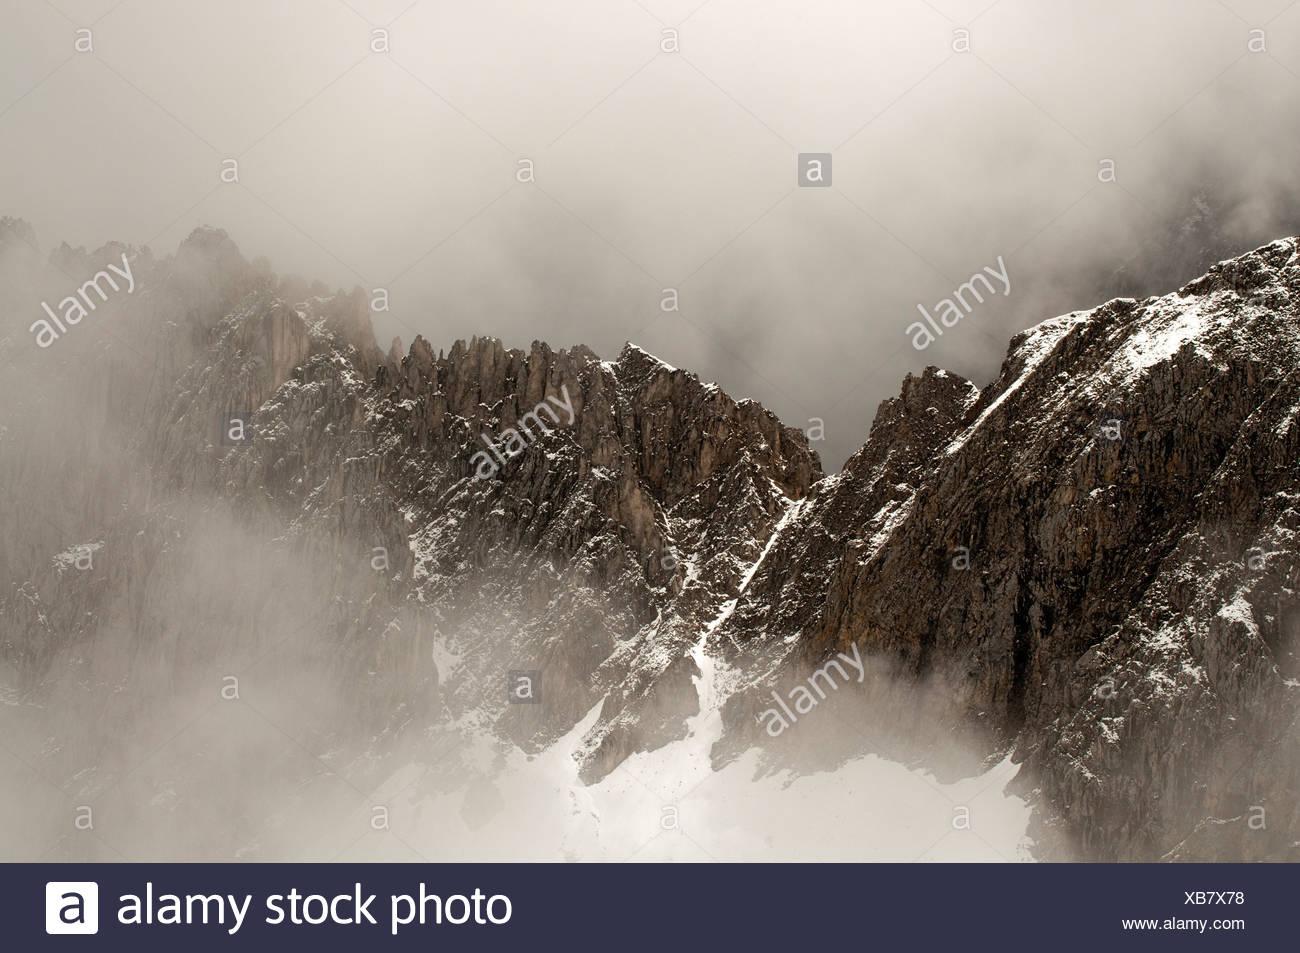 Misty mountain landscape, Nordkette, Karwendel Mountains, Tyrol, Austria, Europe - Stock Image